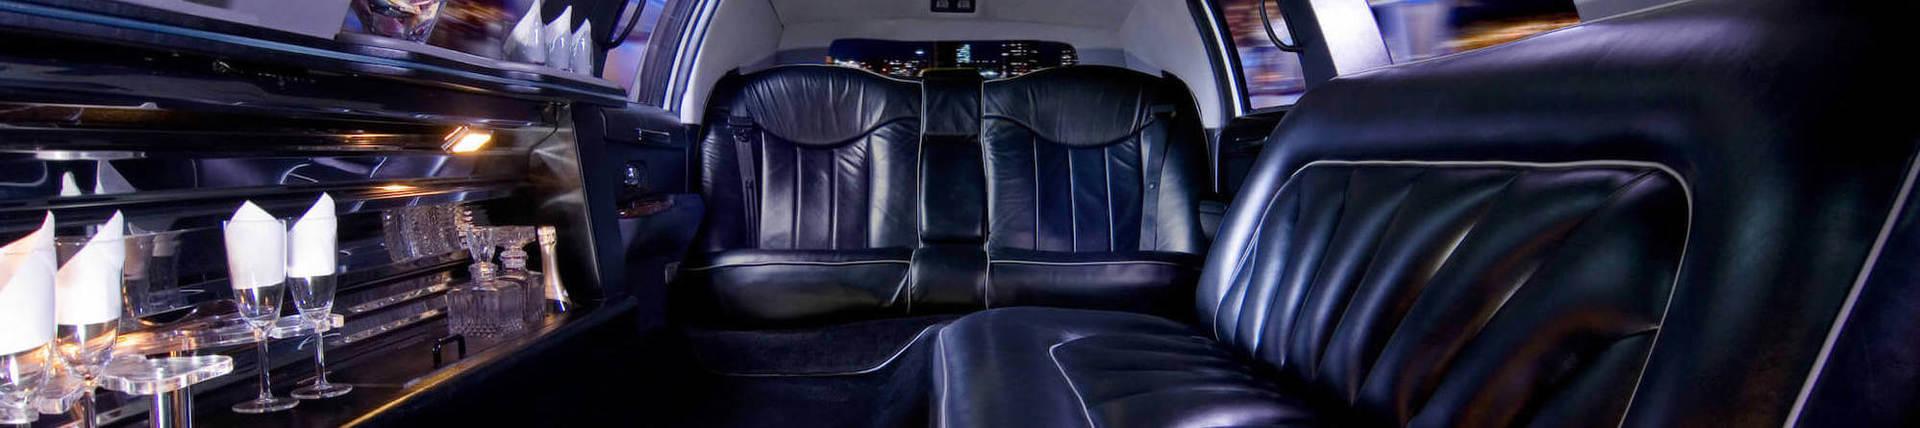 limo service bradenton fl